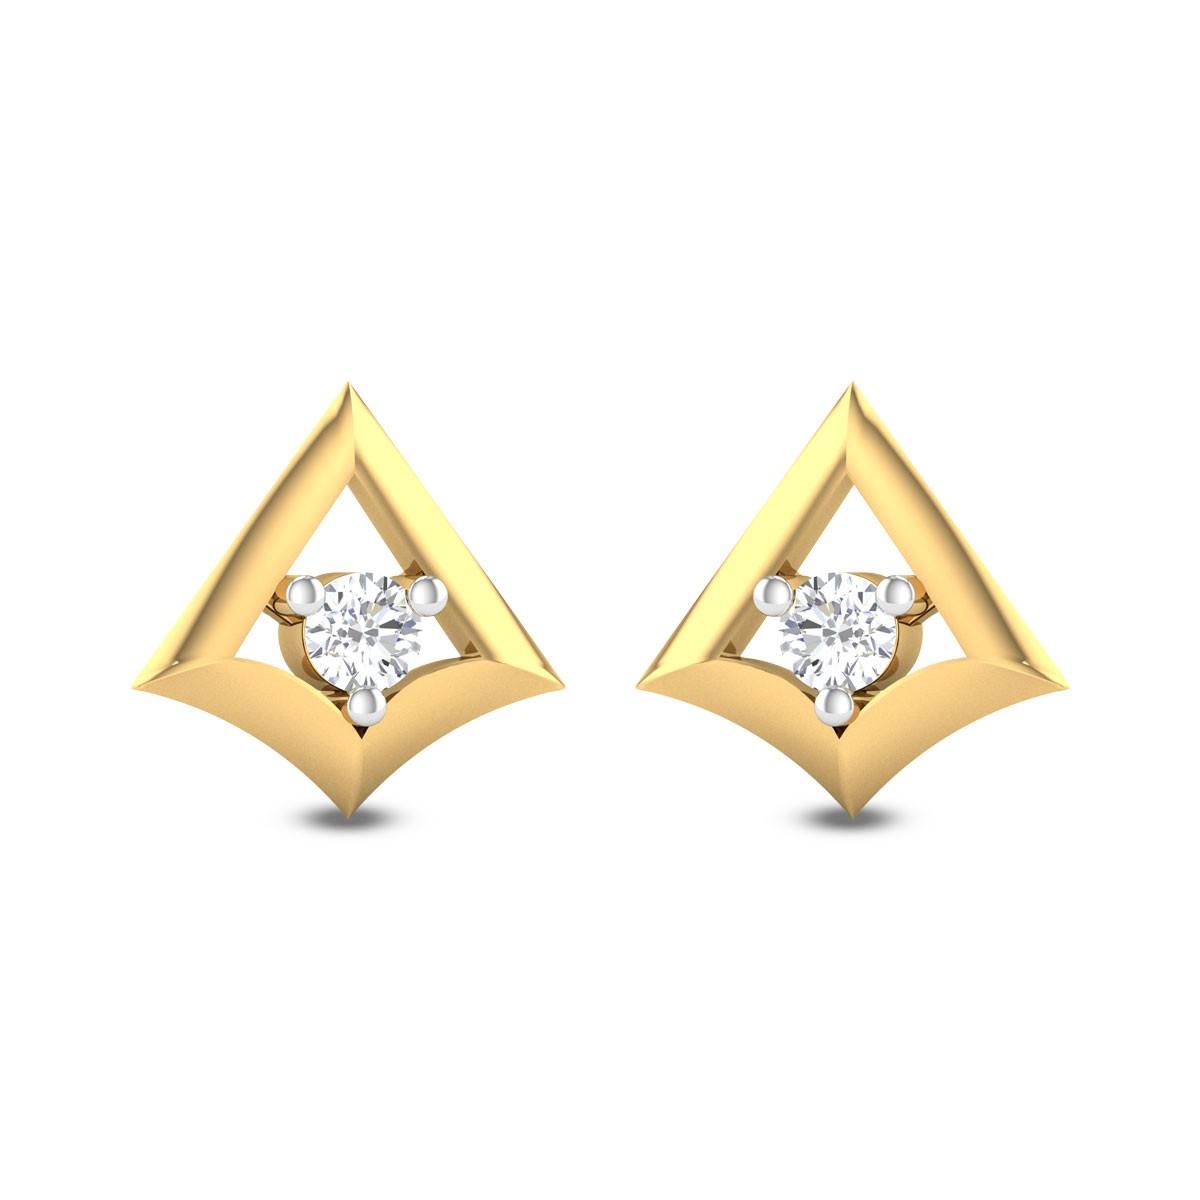 Kirati Solitaire Stud Earrings